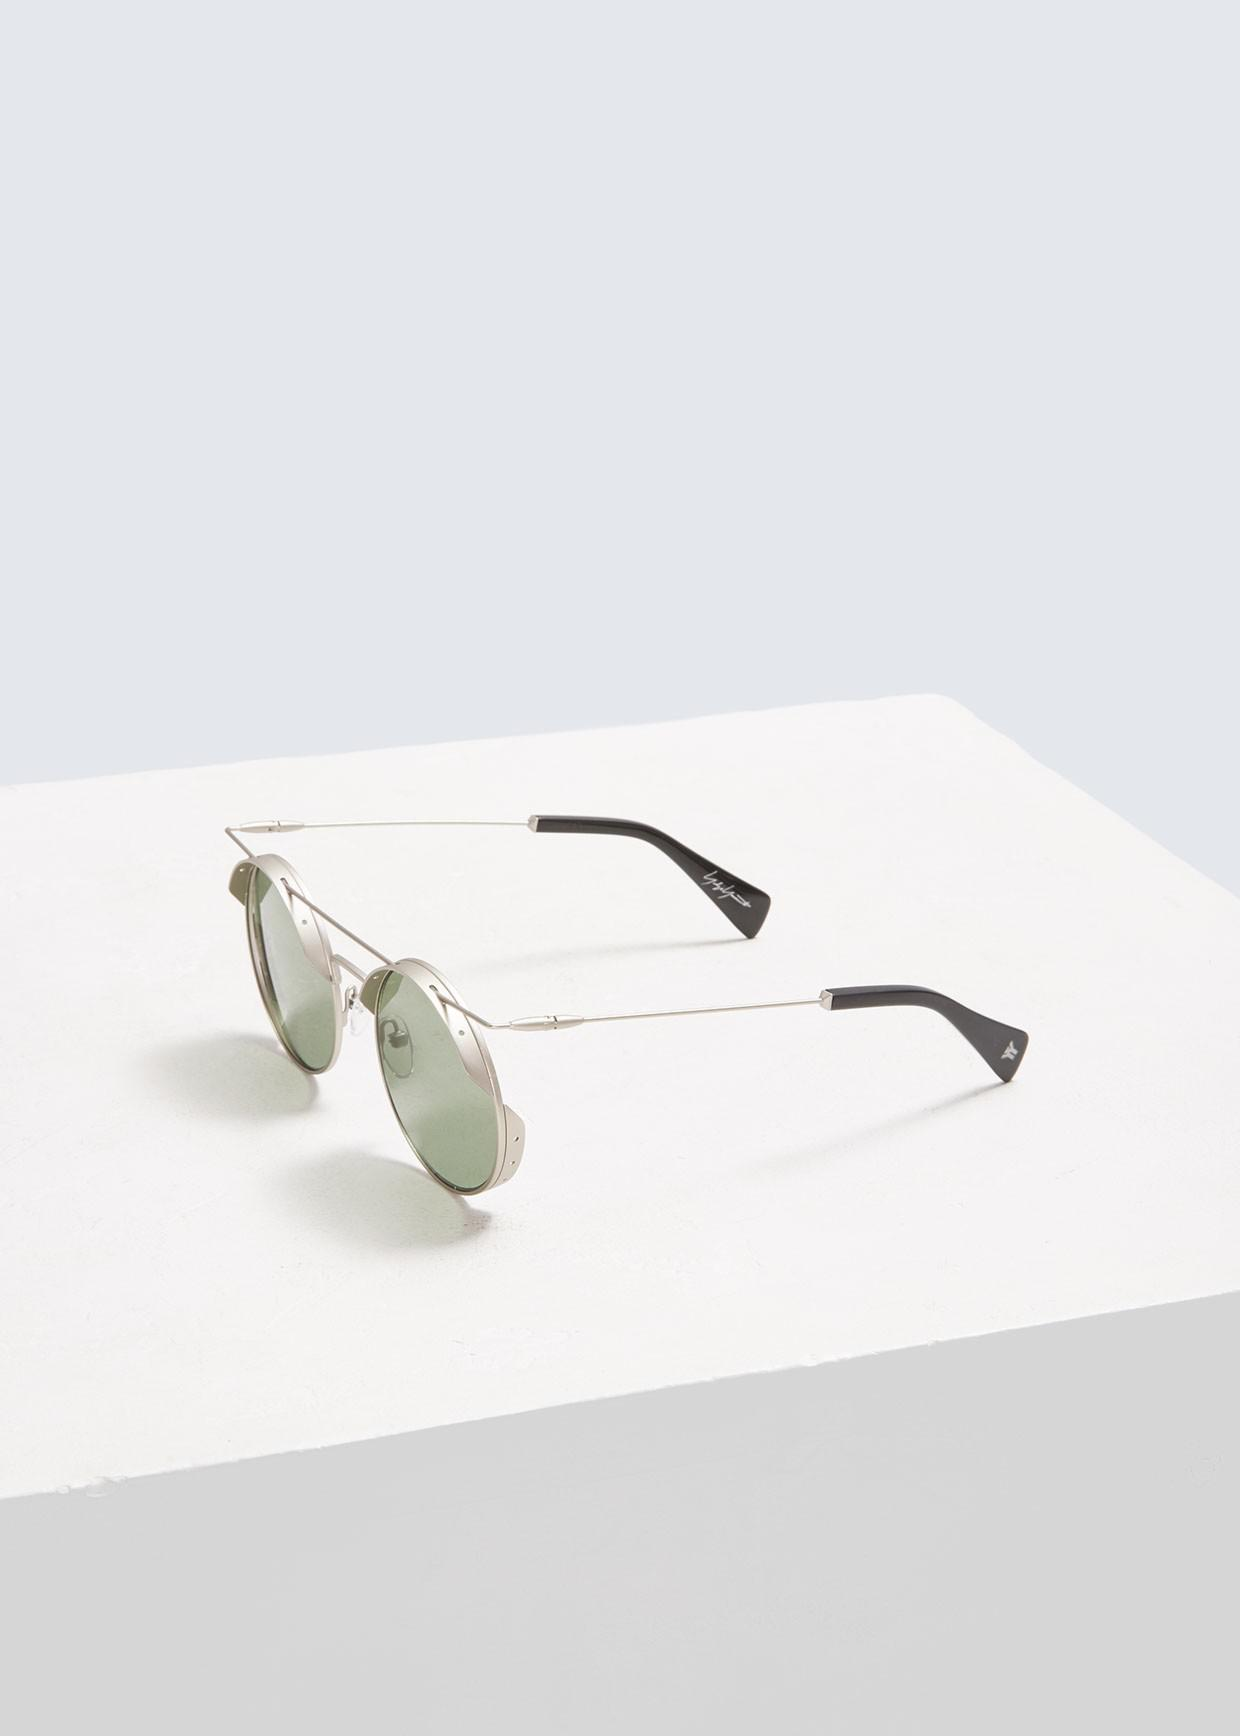 6802e125d0a Lyst - Yohji Yamamoto Steampunk Sunglasses in Metallic